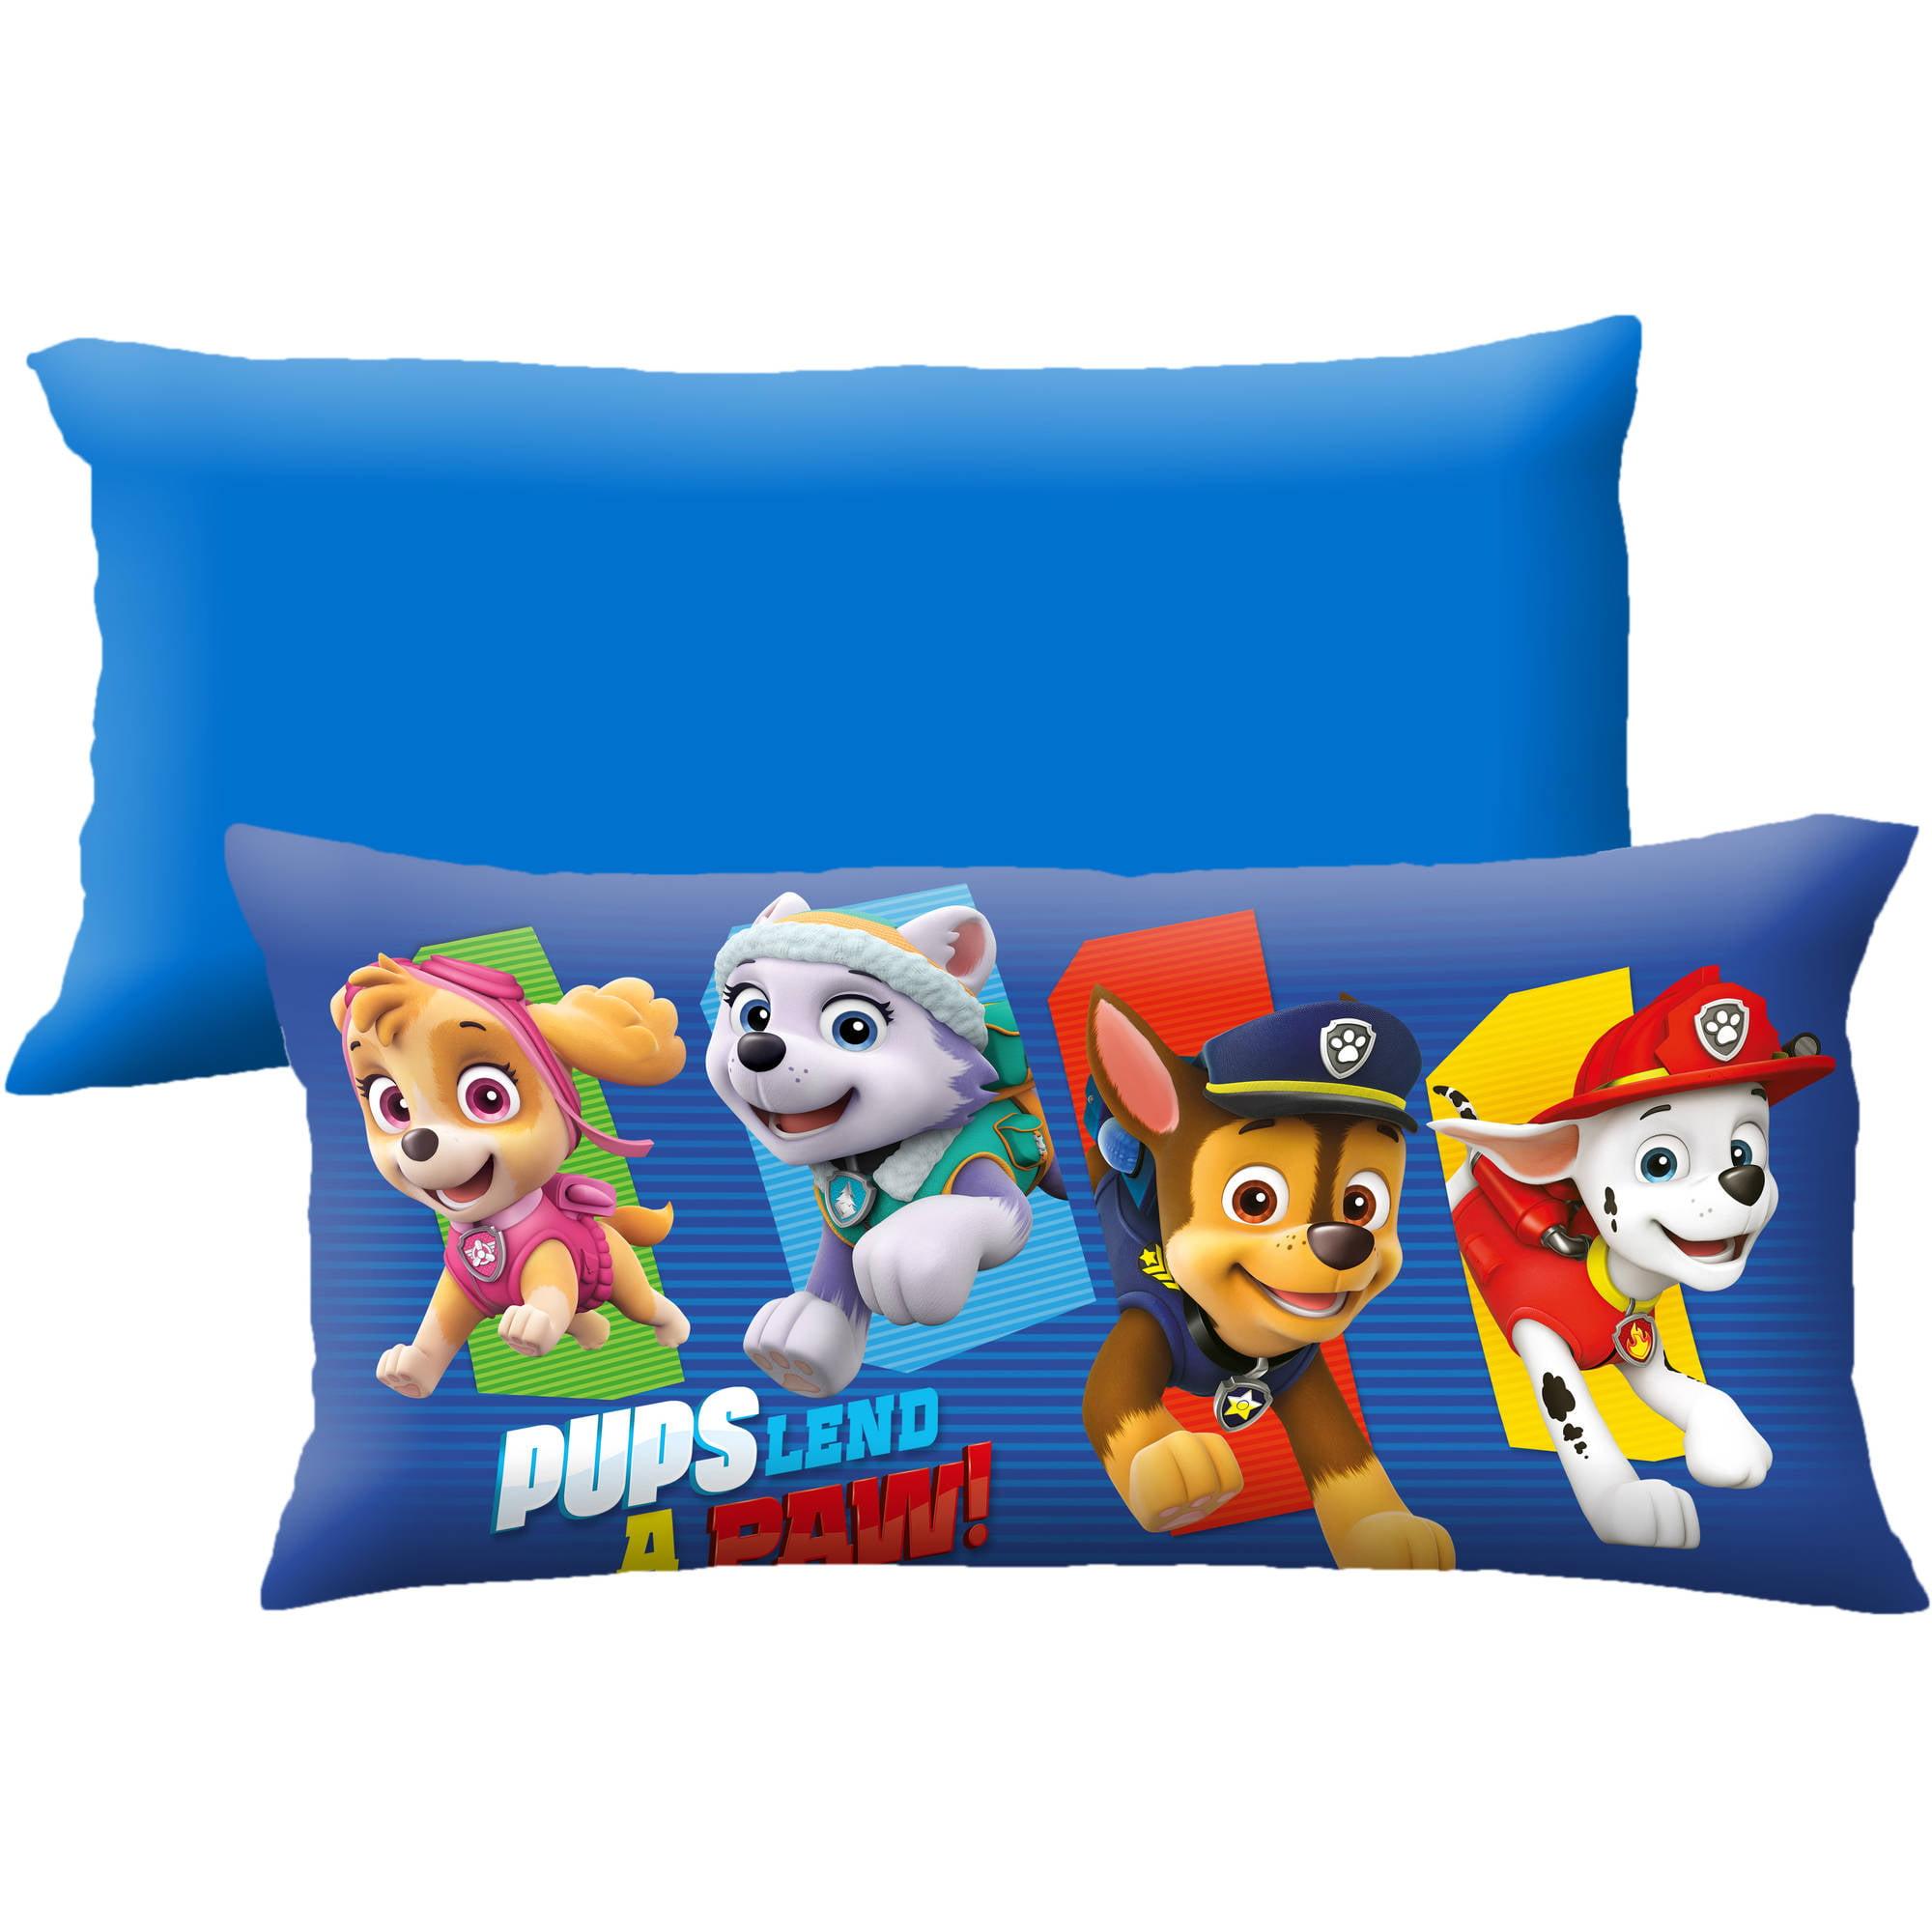 Nickelodeon S Paw Patrol Lend A Paw 18 X 36 Body Pillow